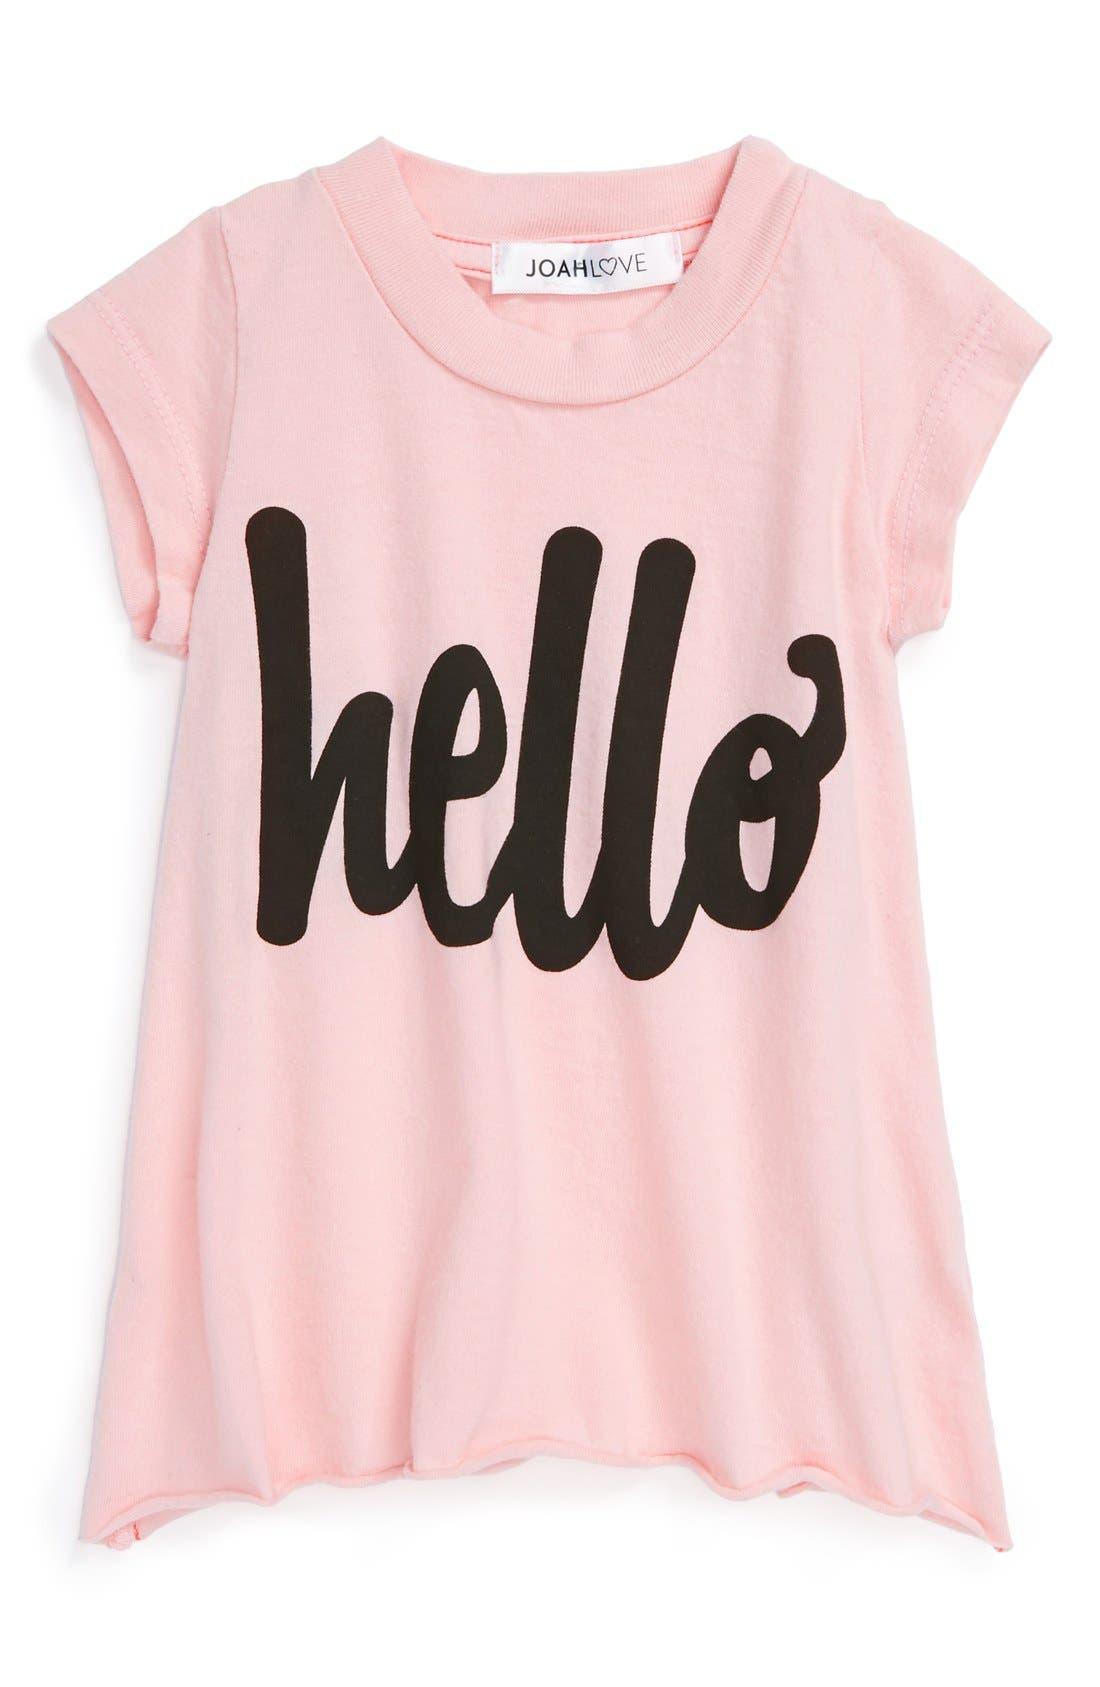 Main Image - Joah Love 'Hello' Tee (Baby Girls)